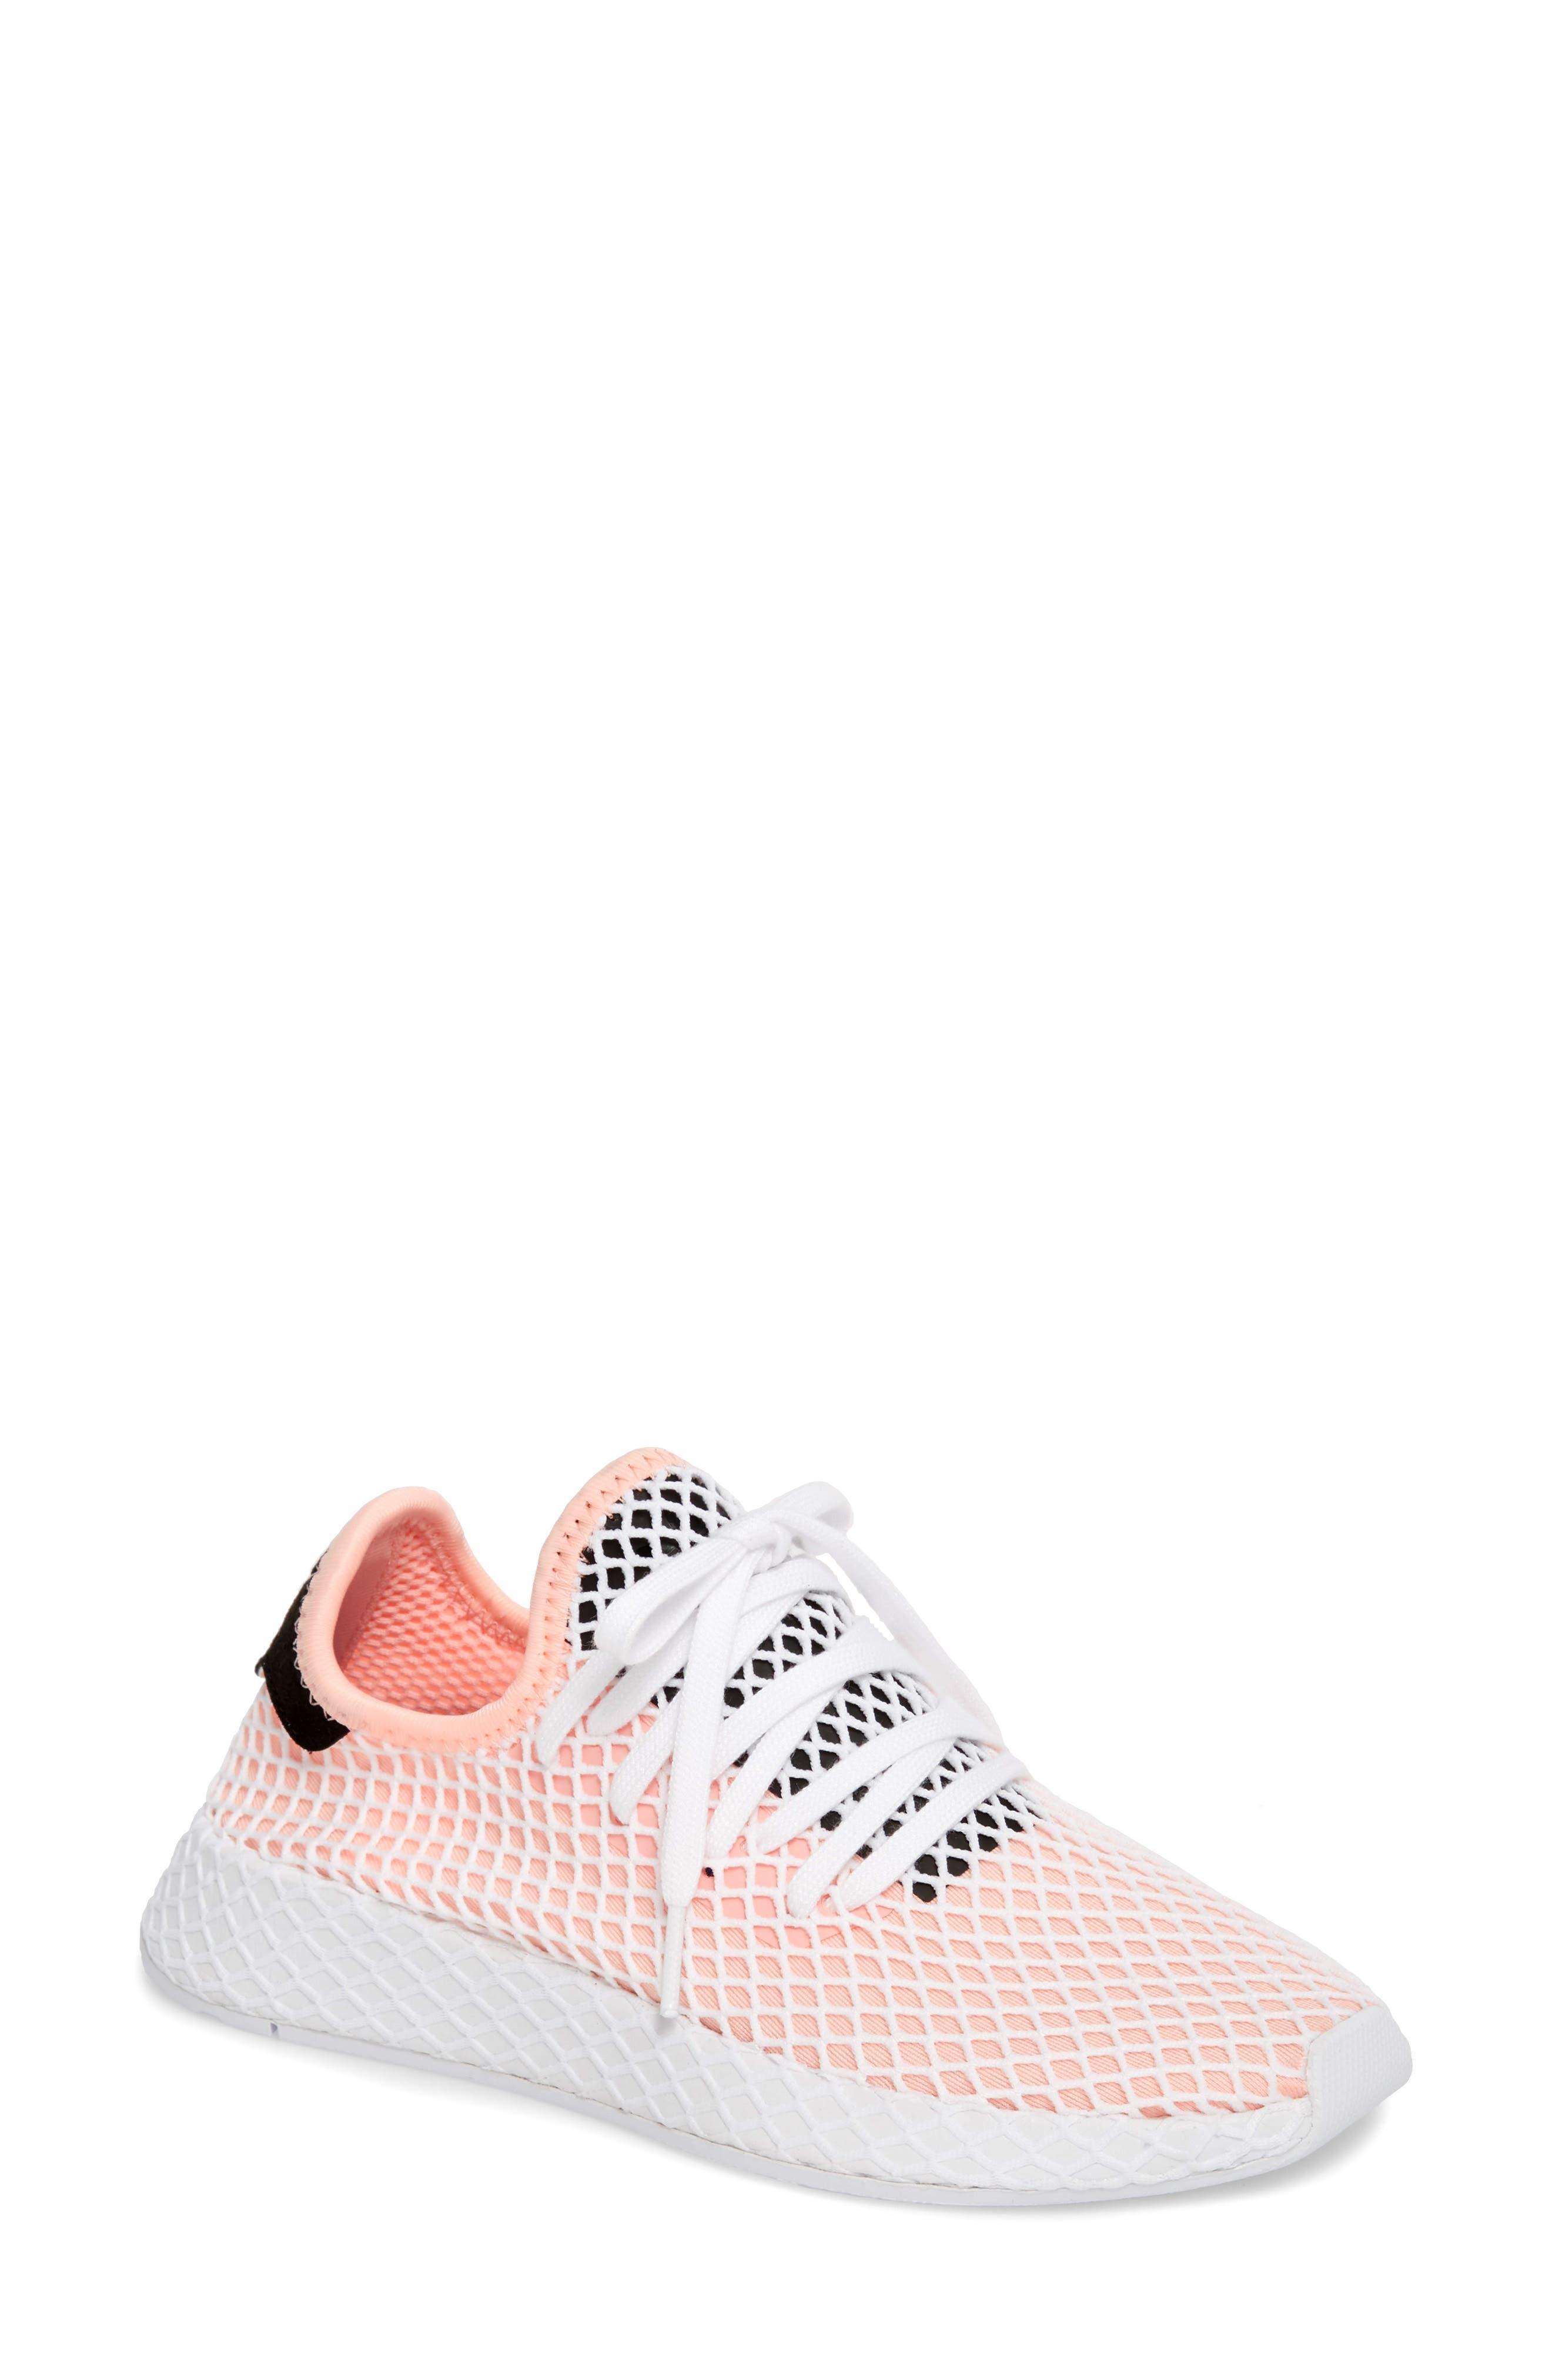 ADIDAS Deerupt Runner Sneaker, Main, color, 660